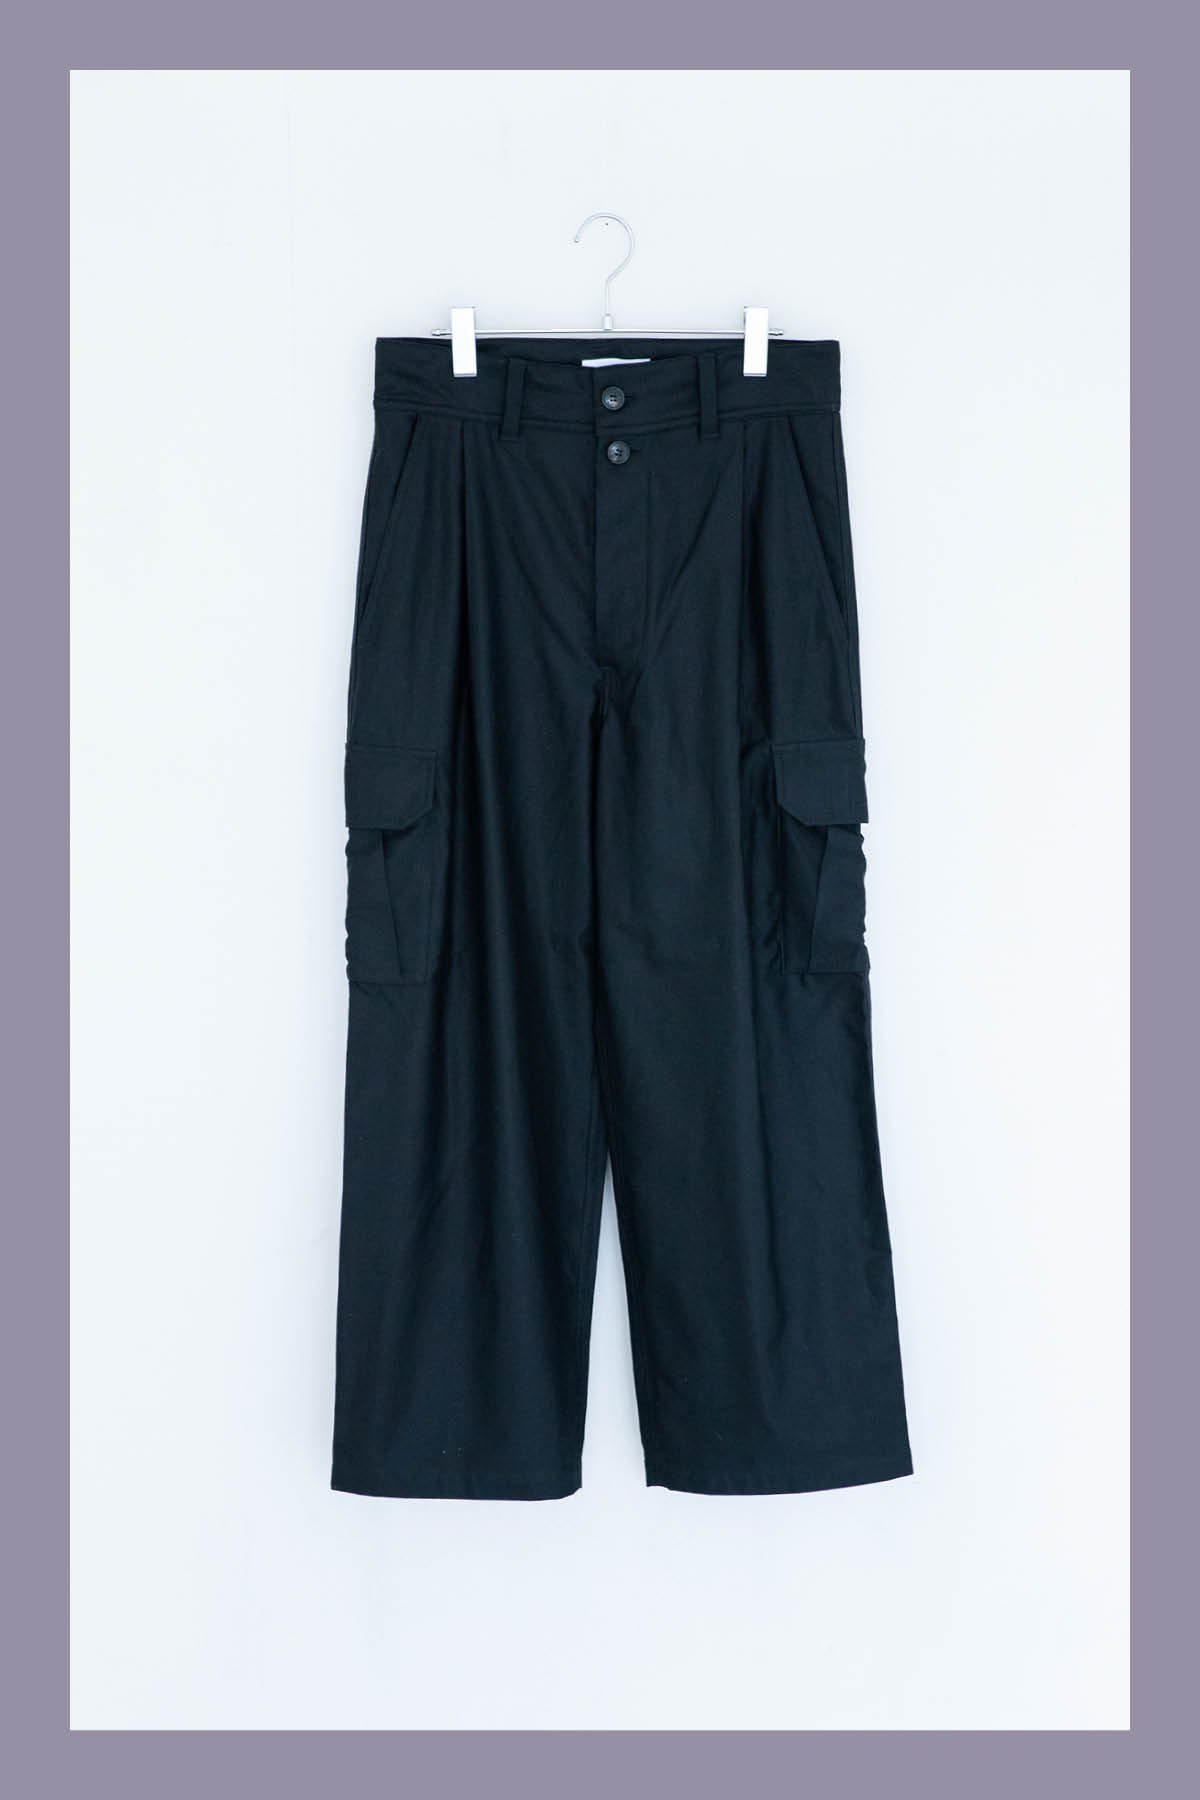 SHO NAGATA / Cross Tack Trousers